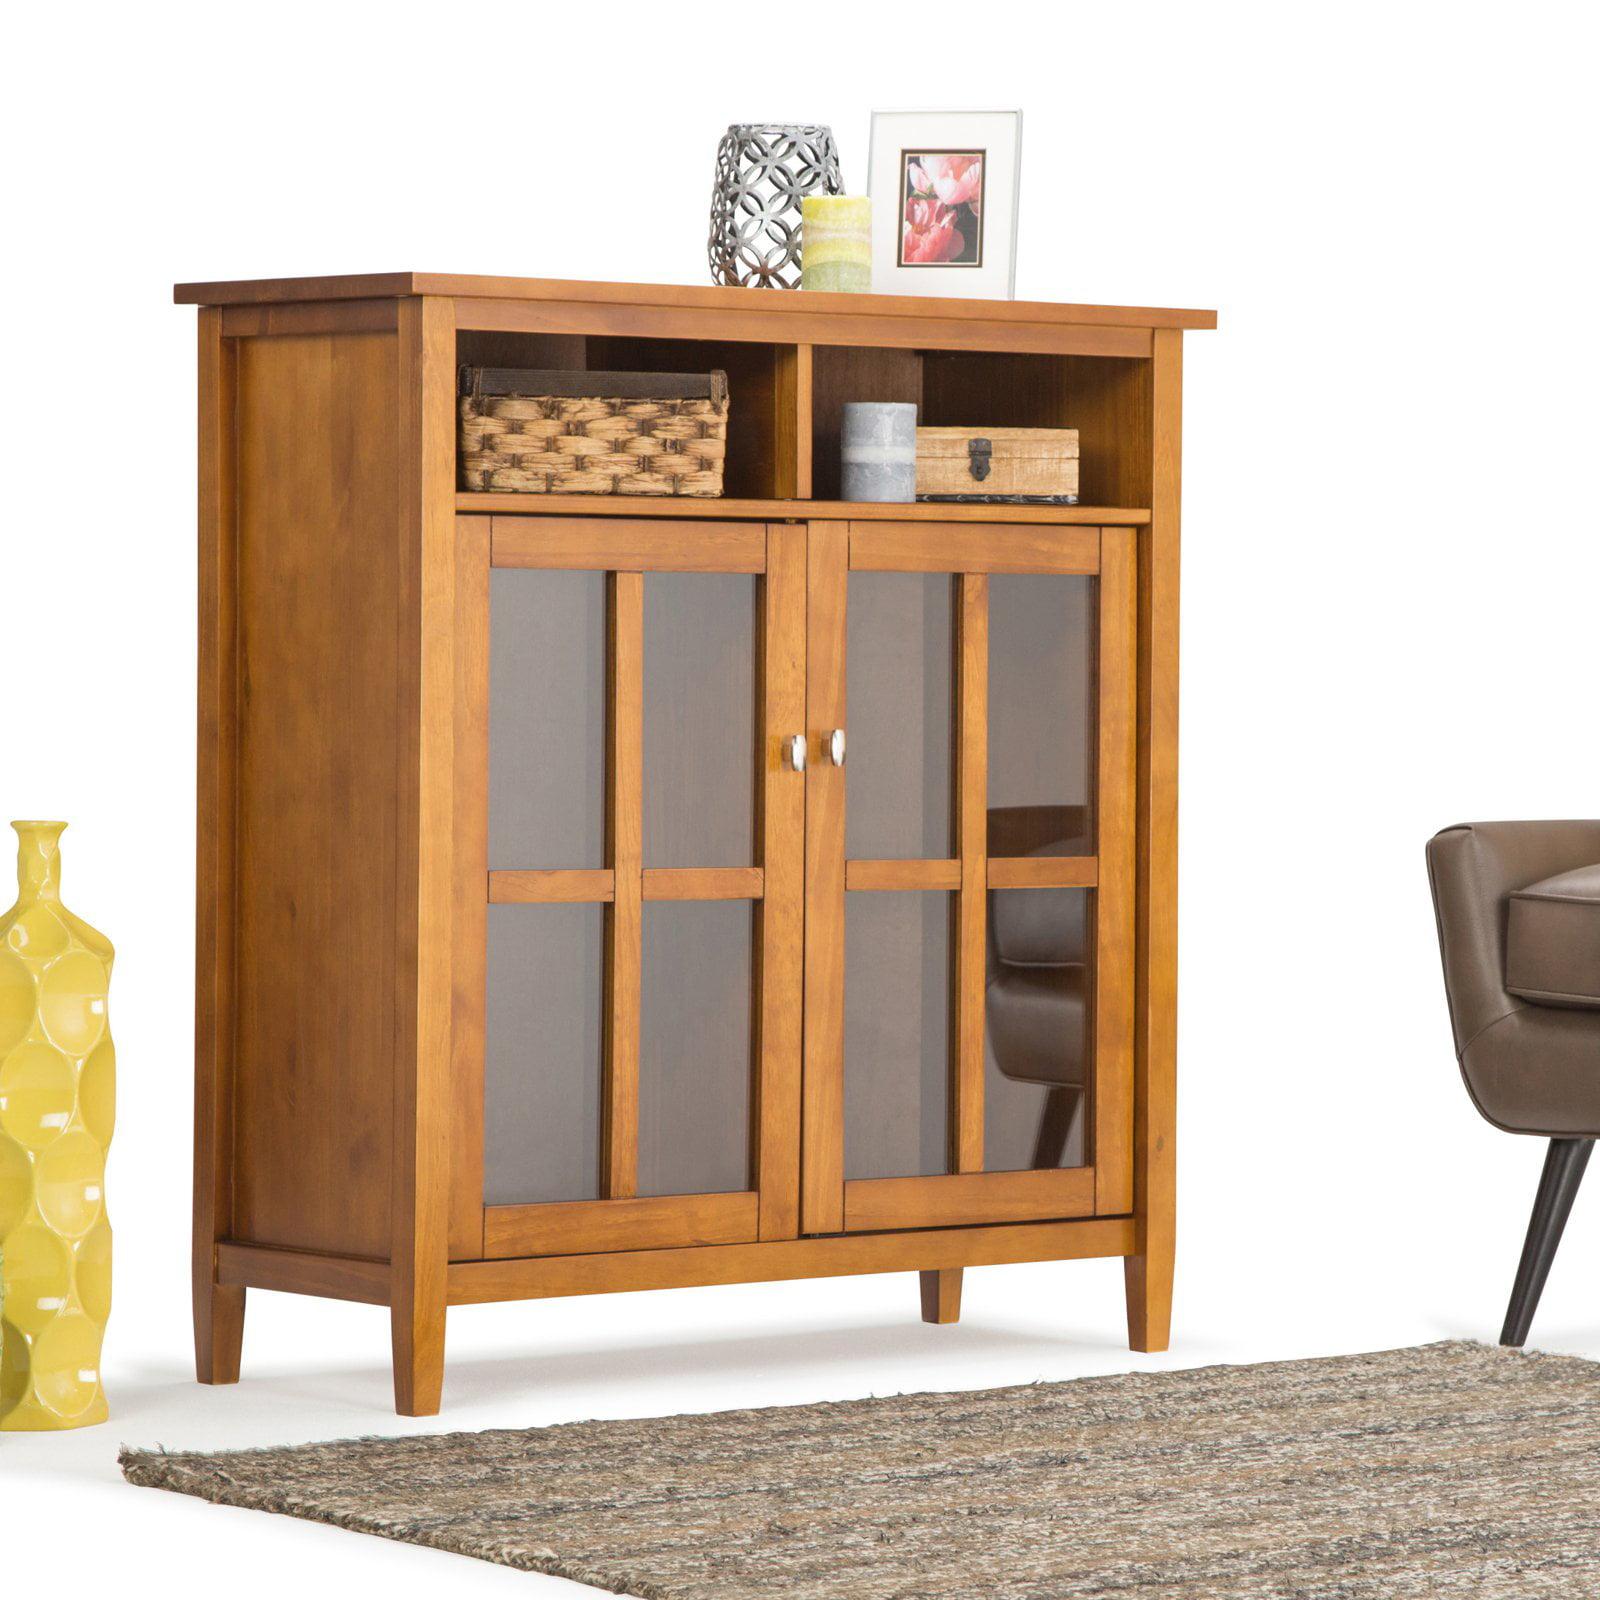 Simpli Home Warm Shaker Medium Storage Media Cabinet by CCT Global Sourcing Inc